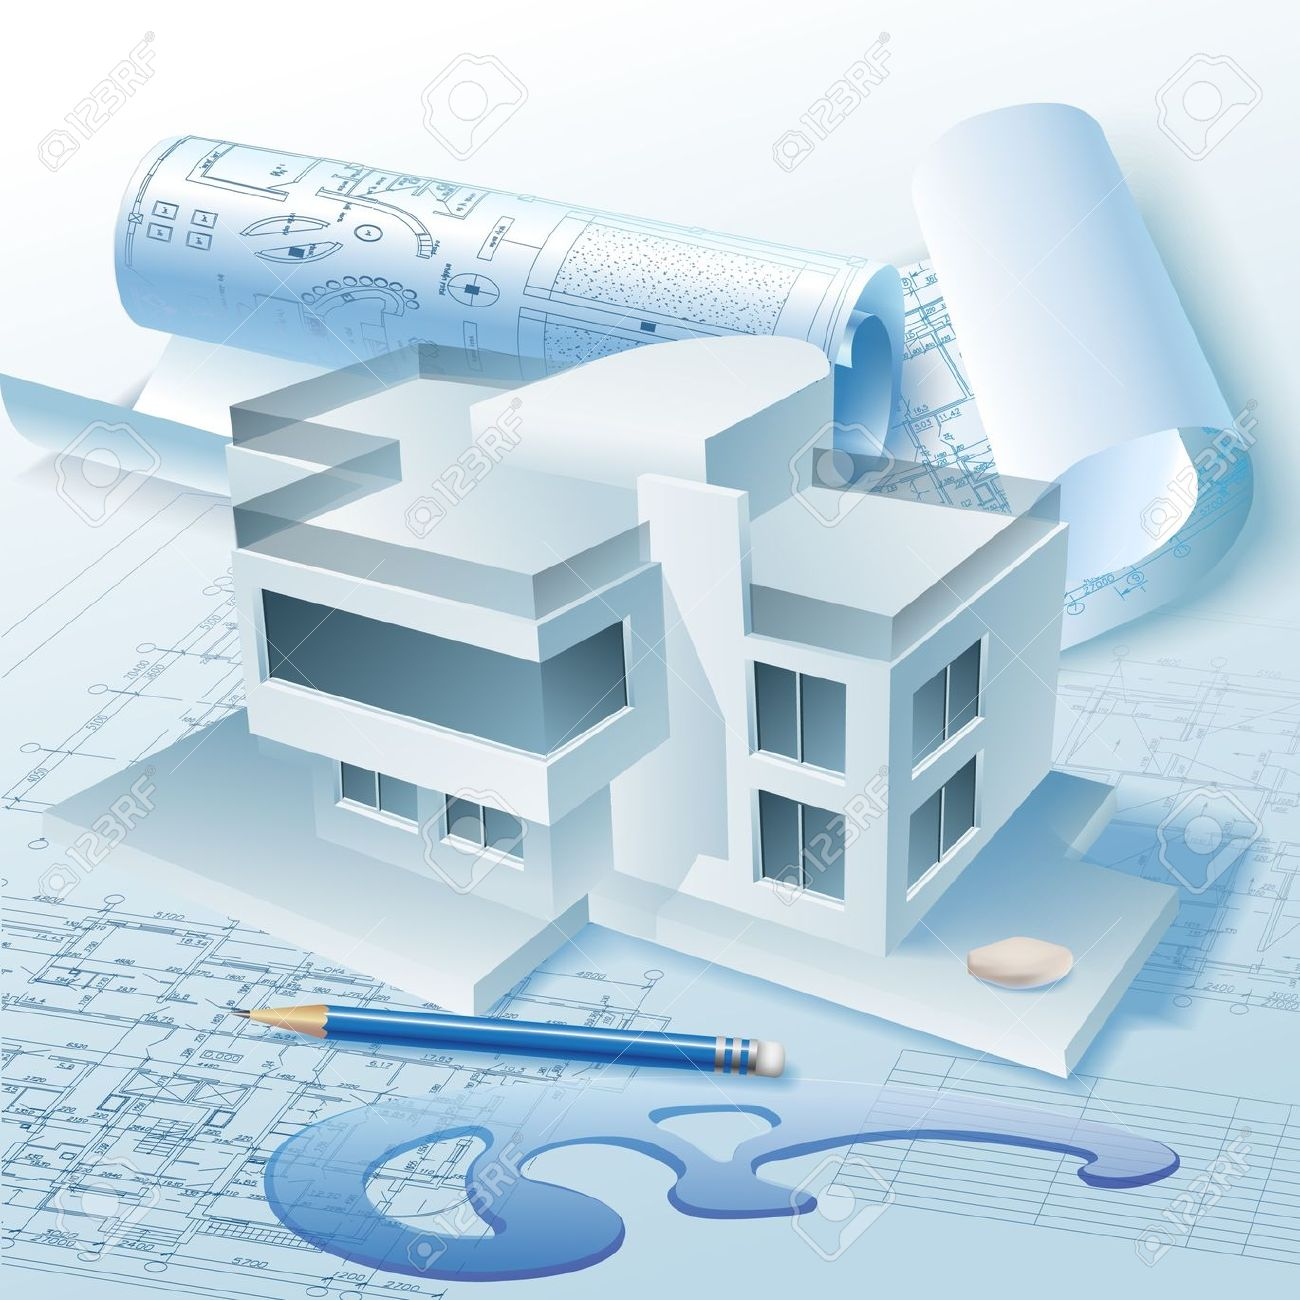 Architecture clipart illustrations.